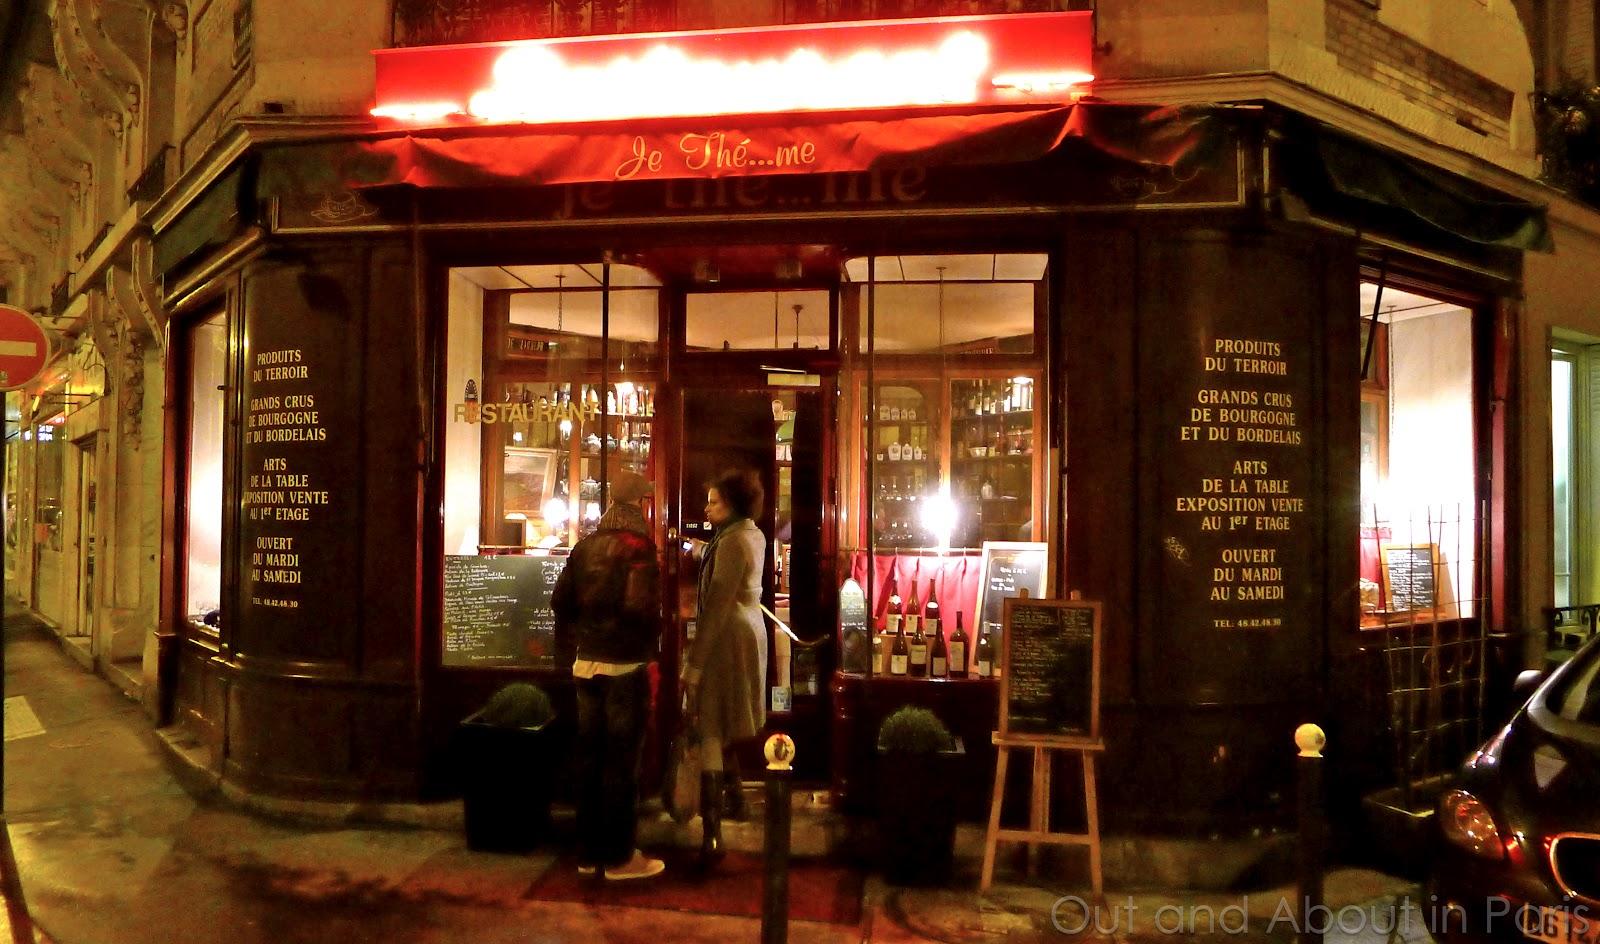 Je thé...me - a romantic restaurant off the beaten-track